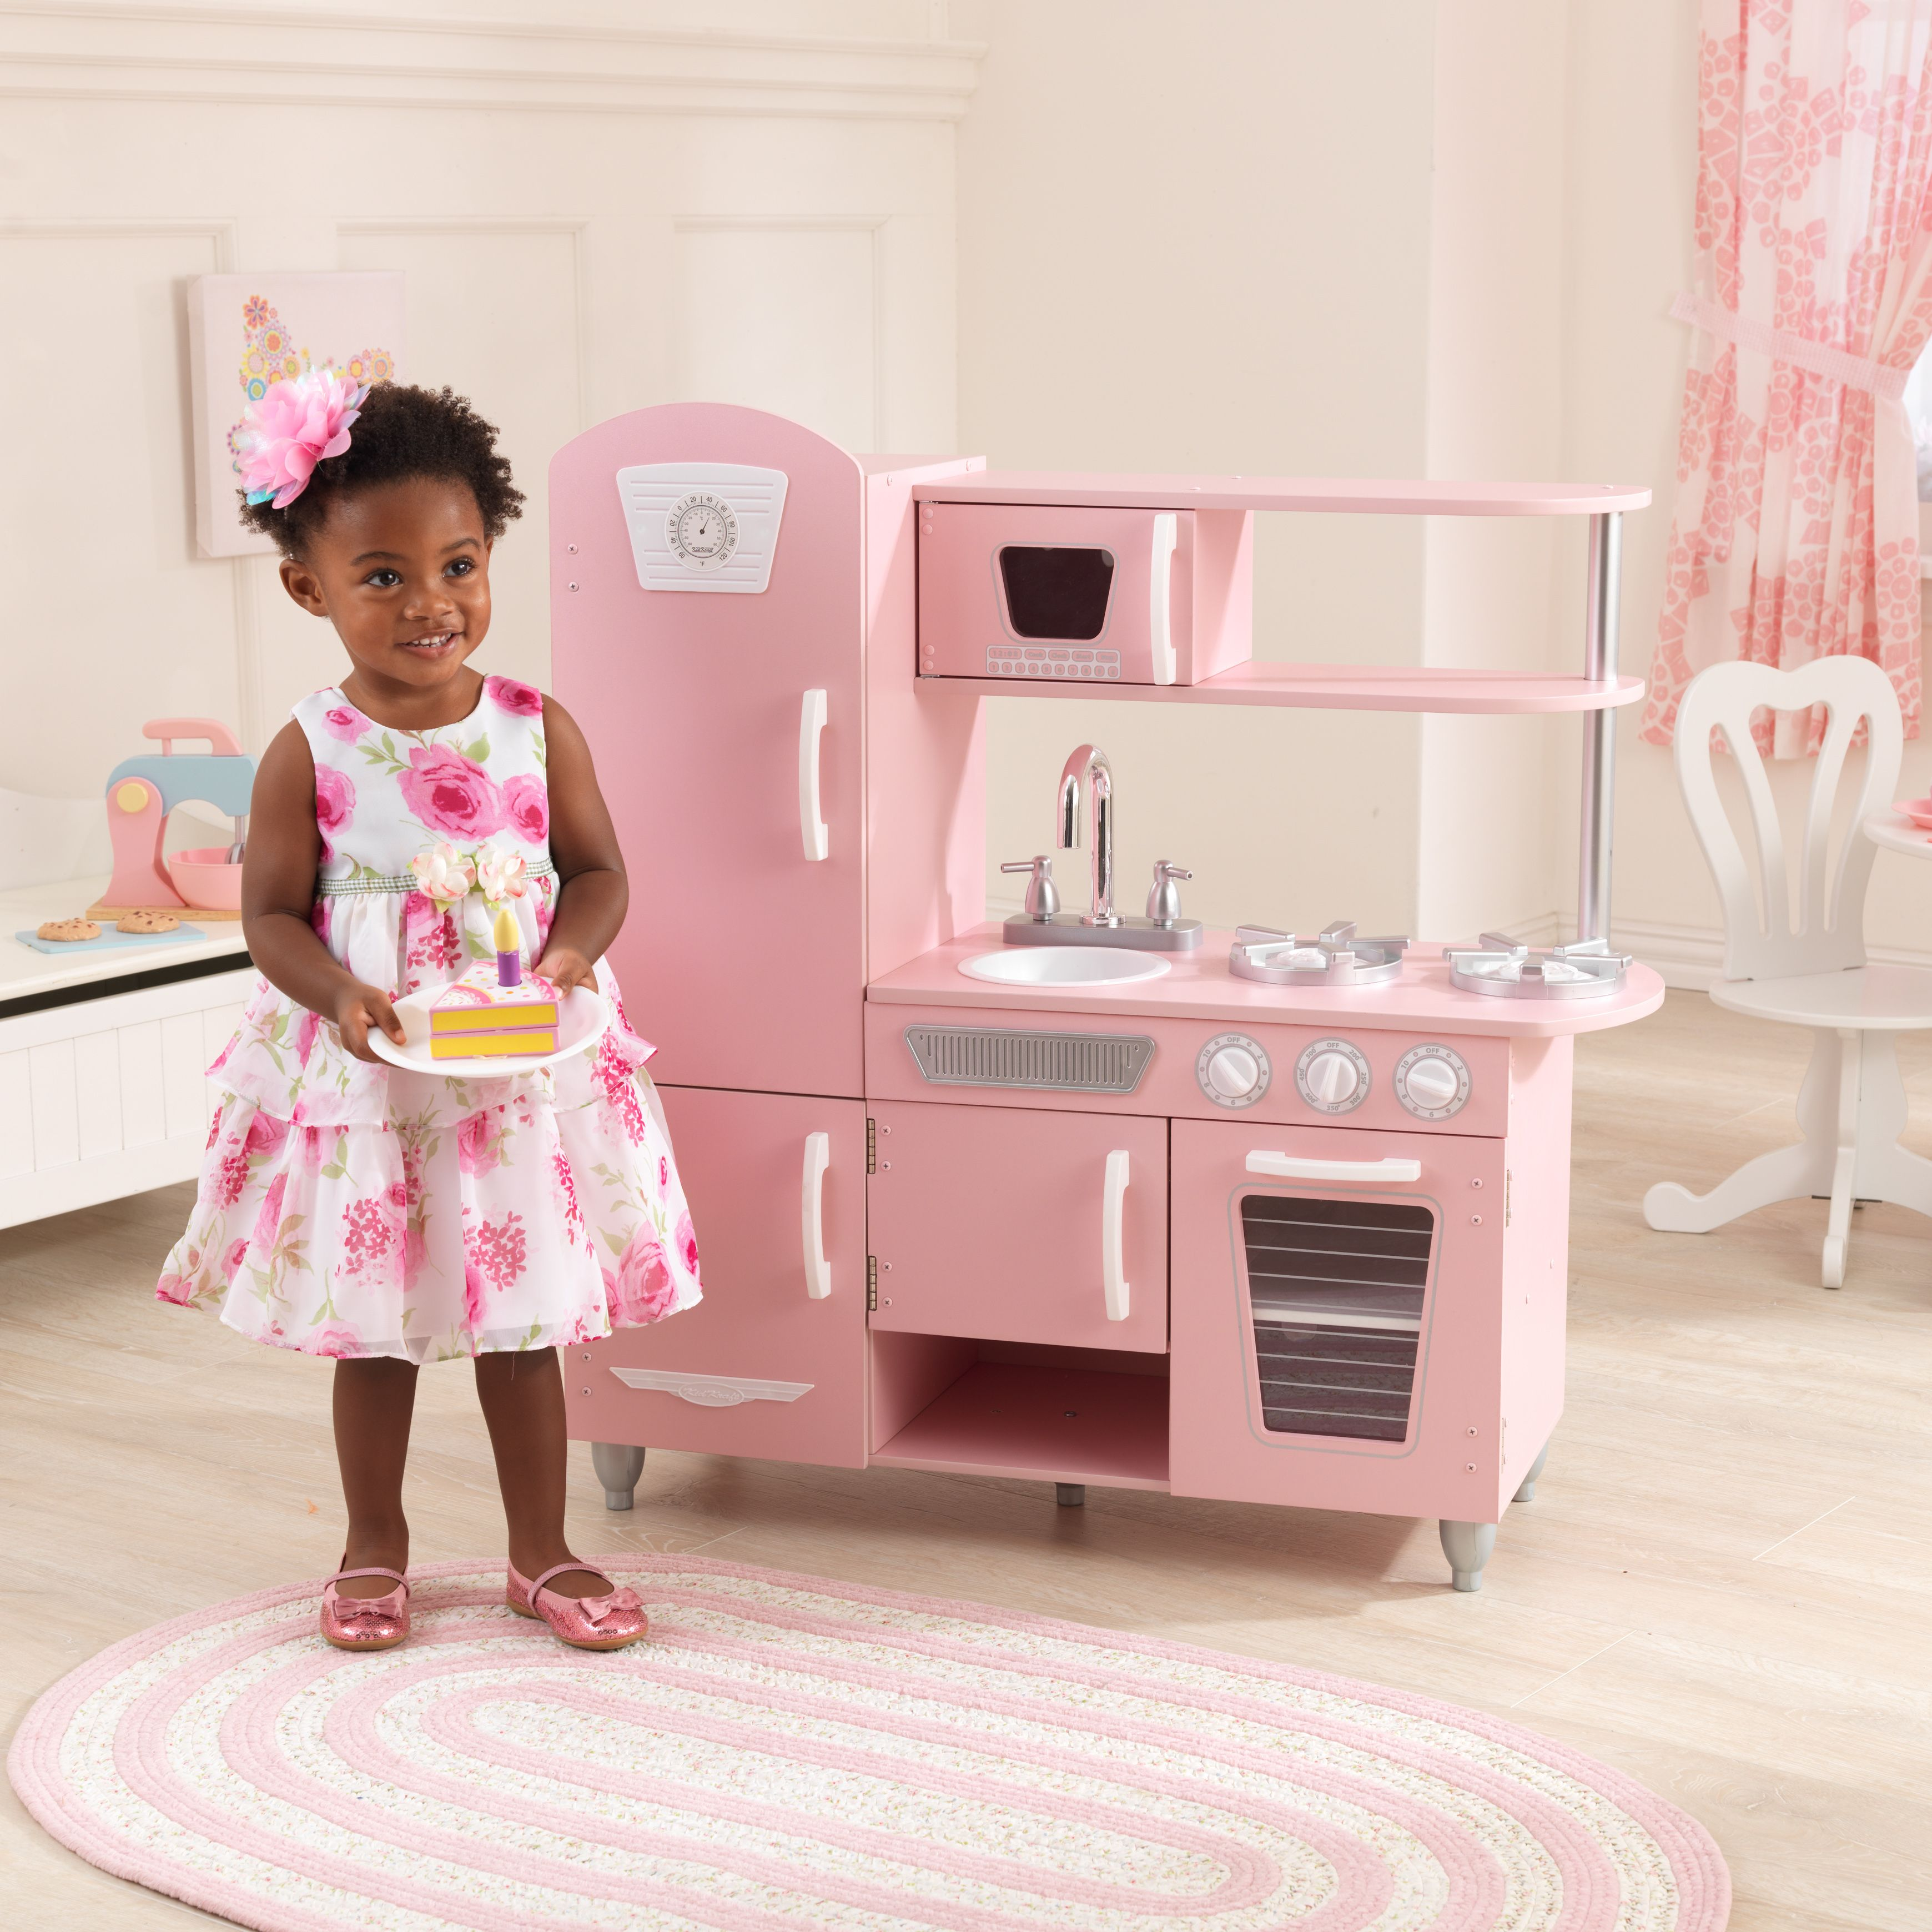 Toys  Kids pretend play kitchen, Kidkraft vintage kitchen, Play